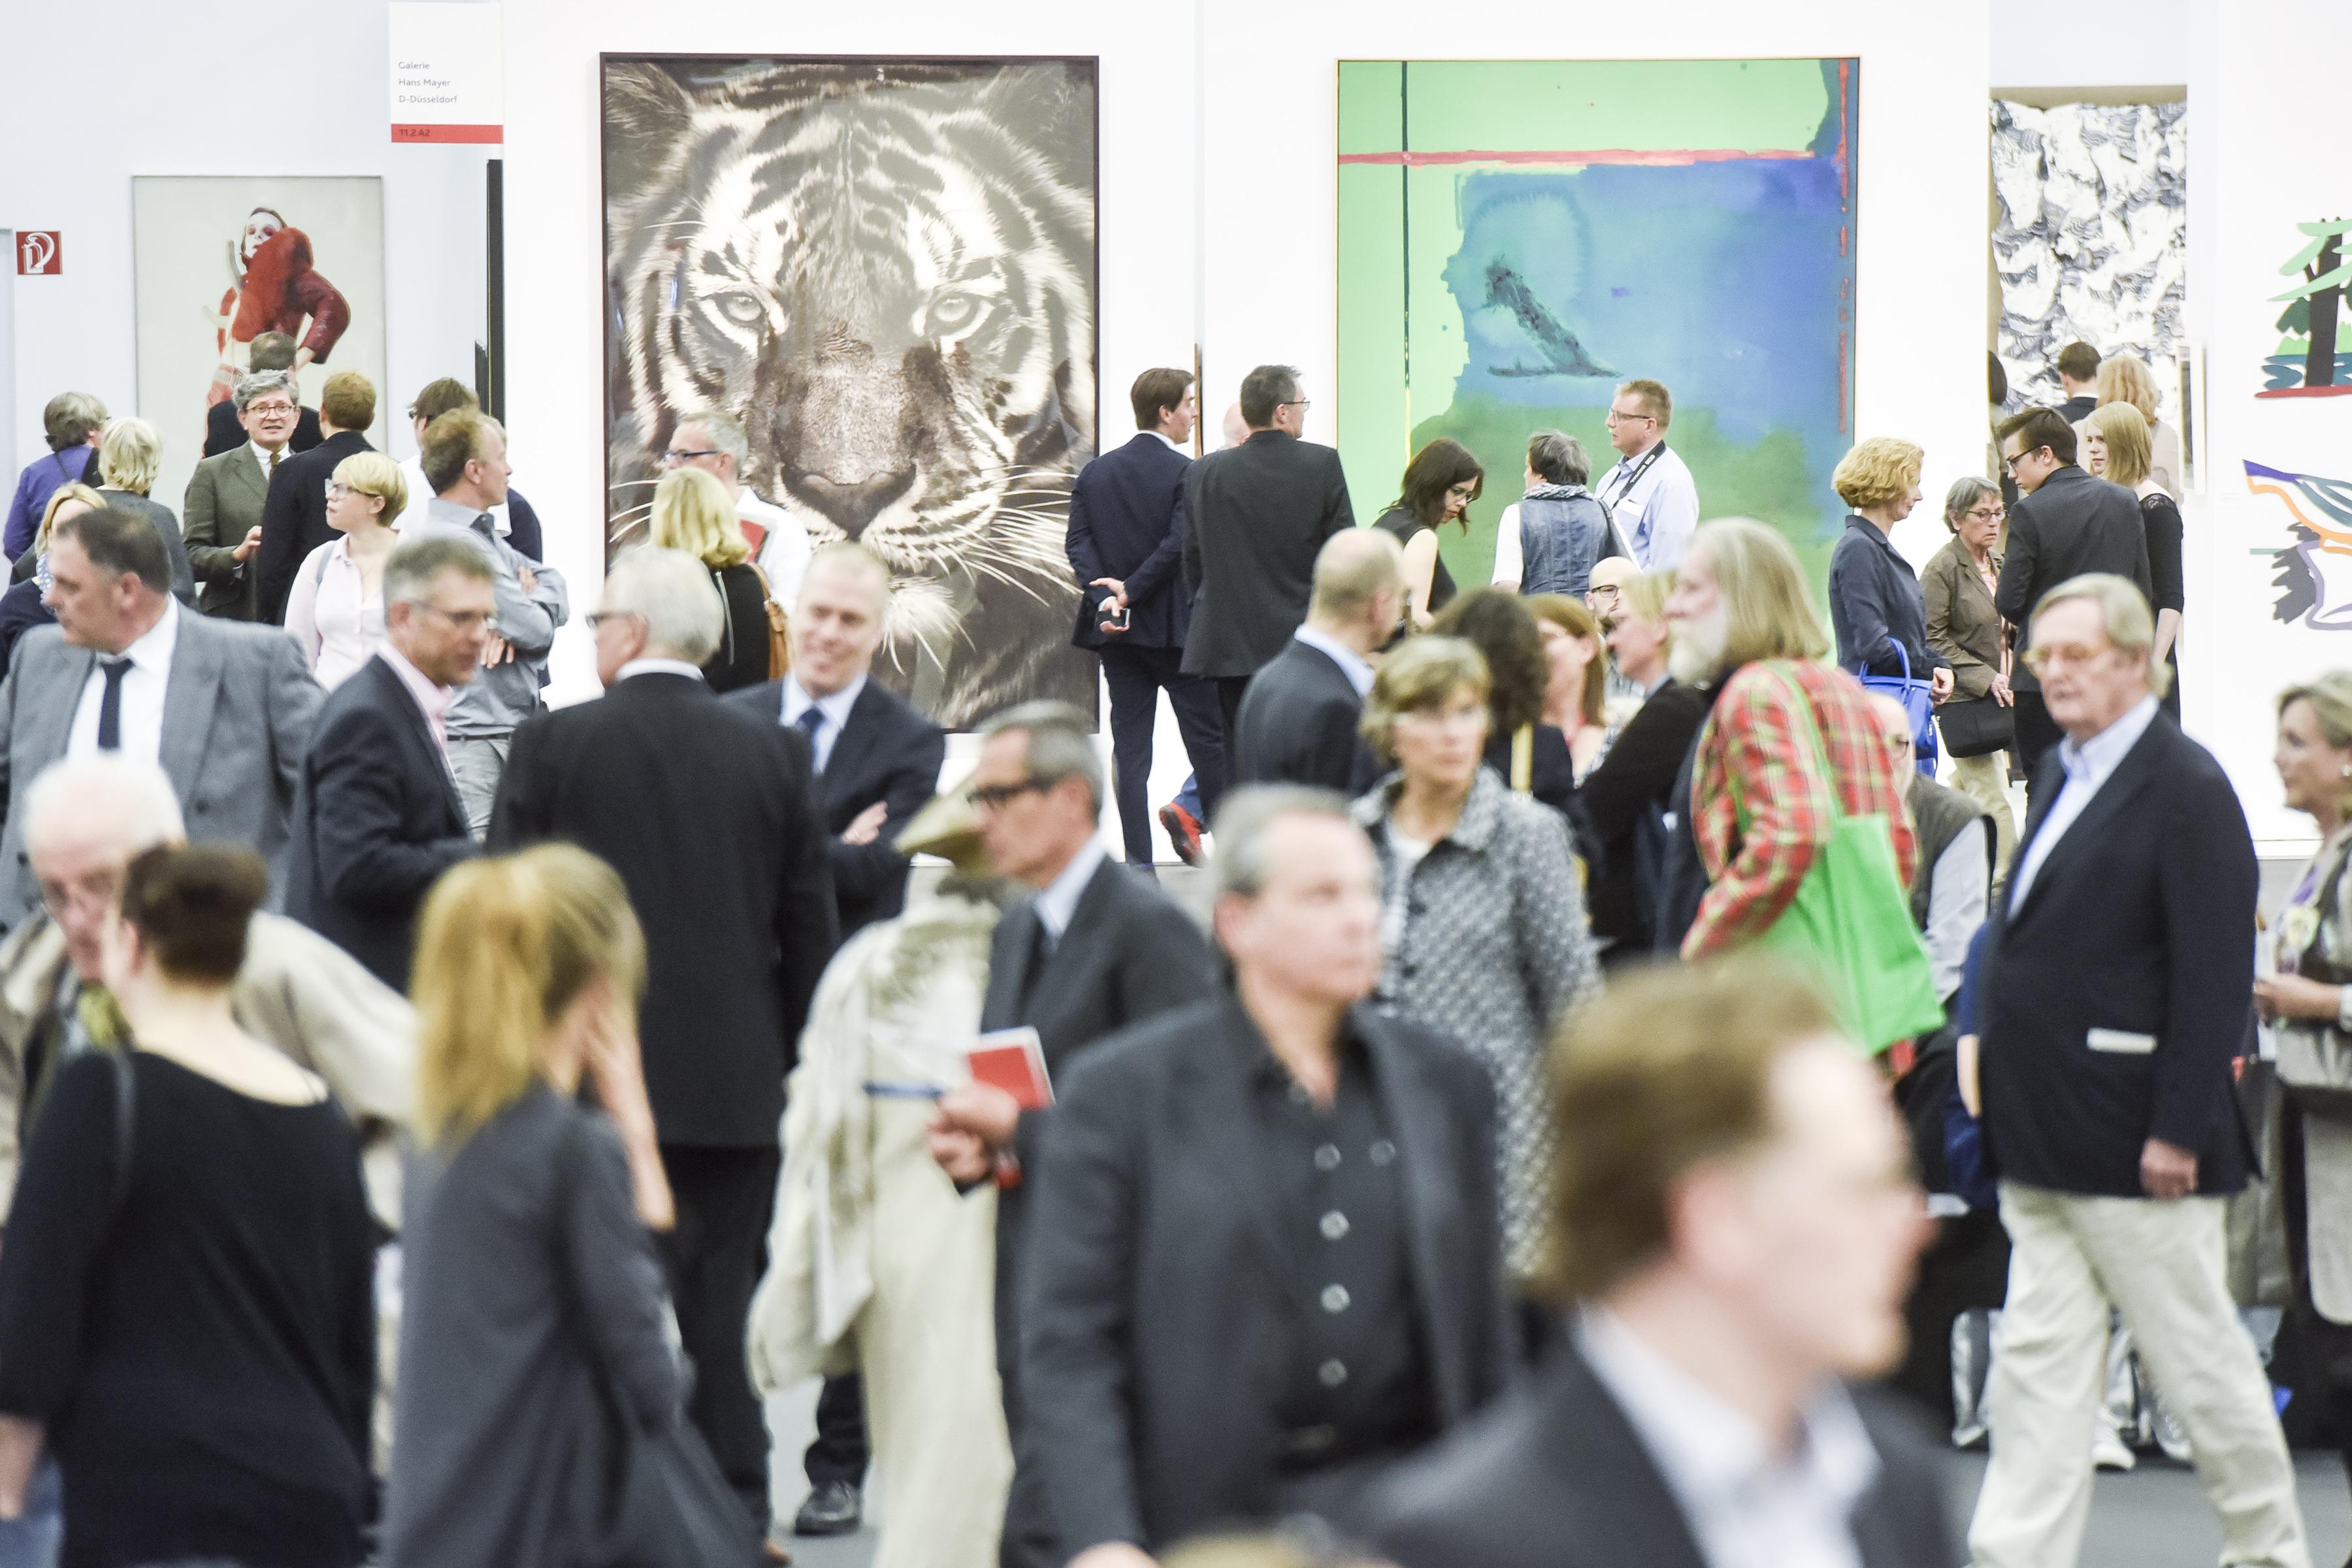 Art Cologne 2016, Fotos Art Cologne Medien Service: Koelnmesse Bilddatenbank